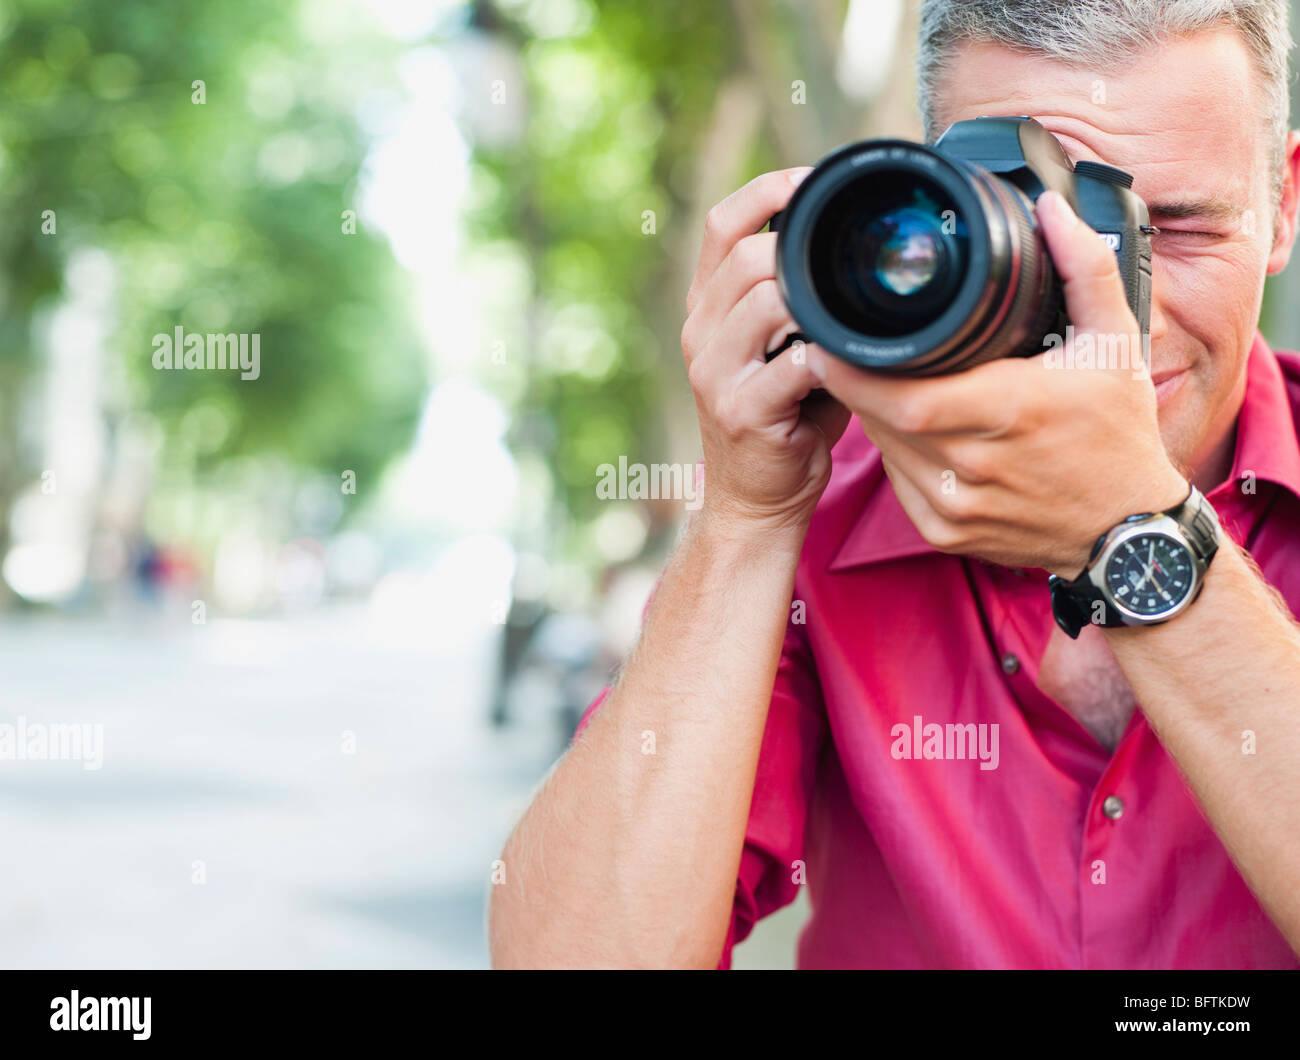 Mann mit Kamera unter Bild Stockbild